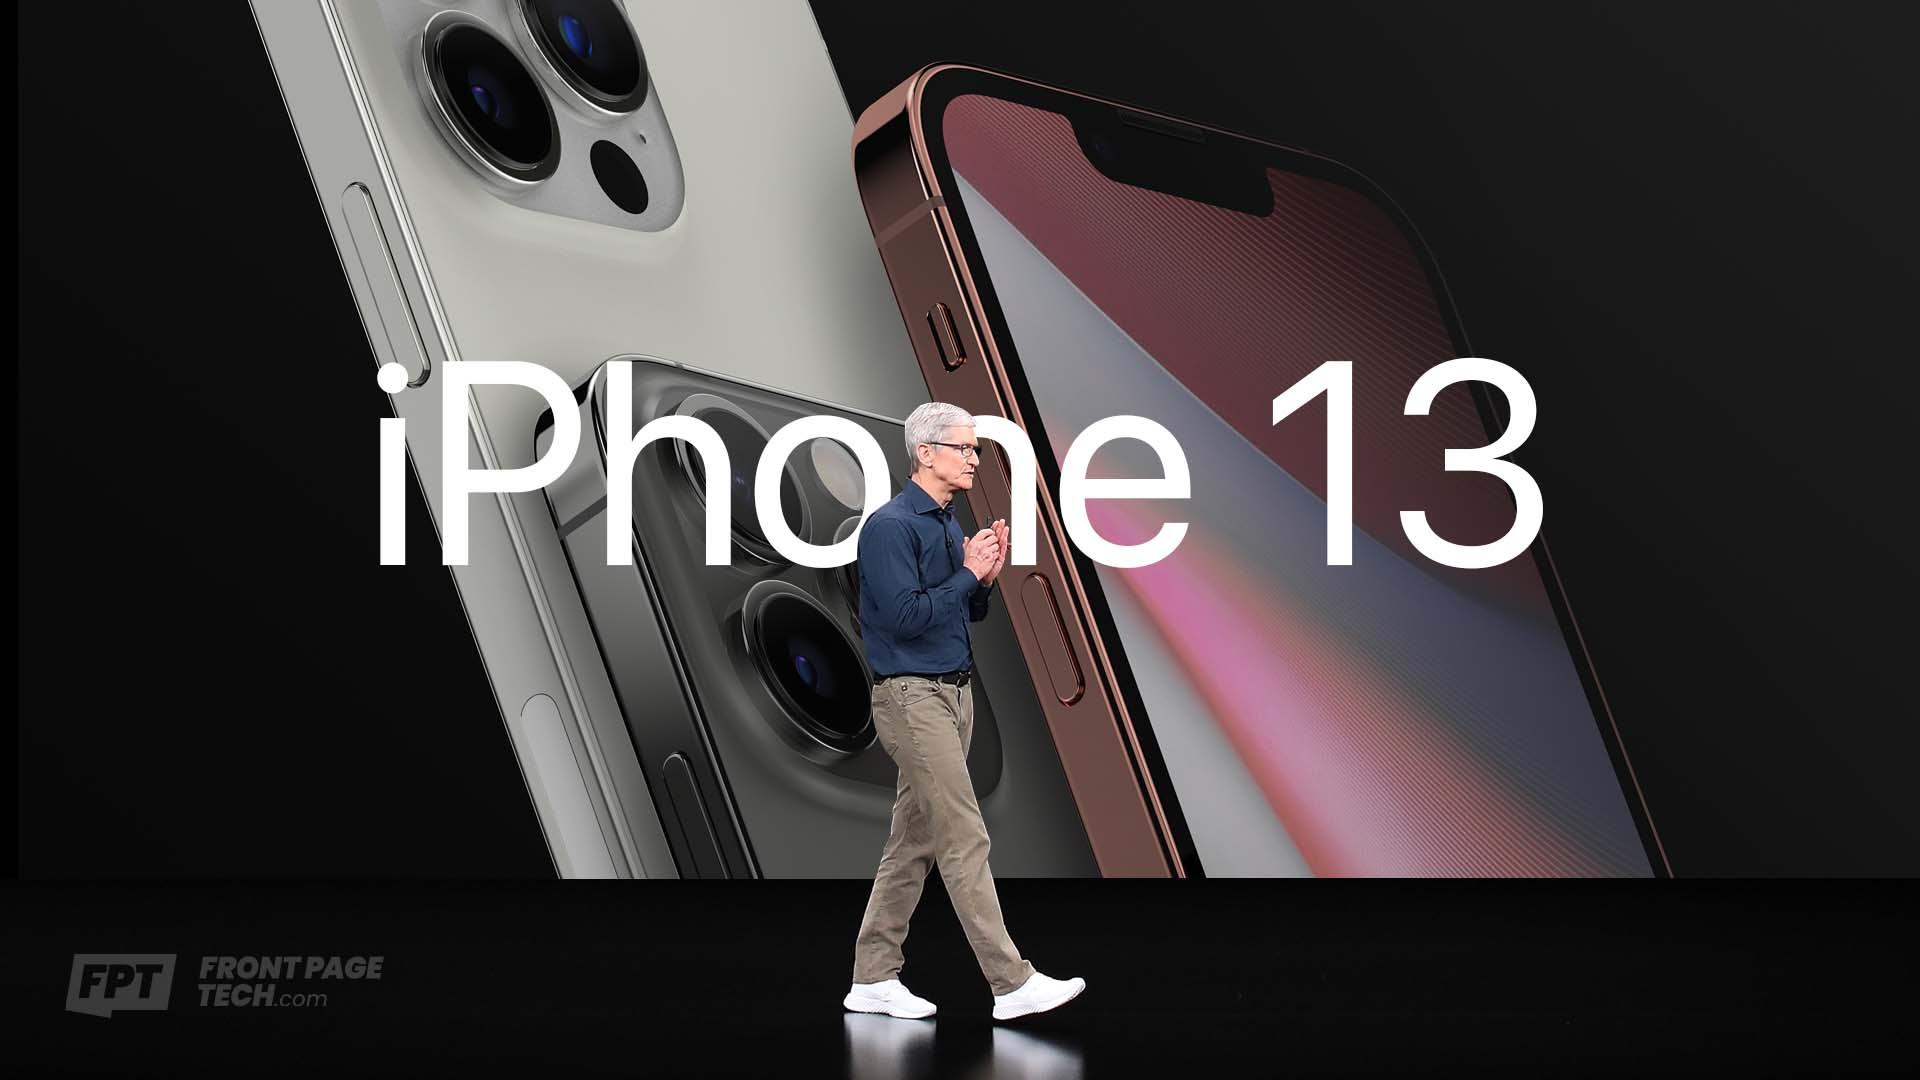 iphone 13 apple data lancio